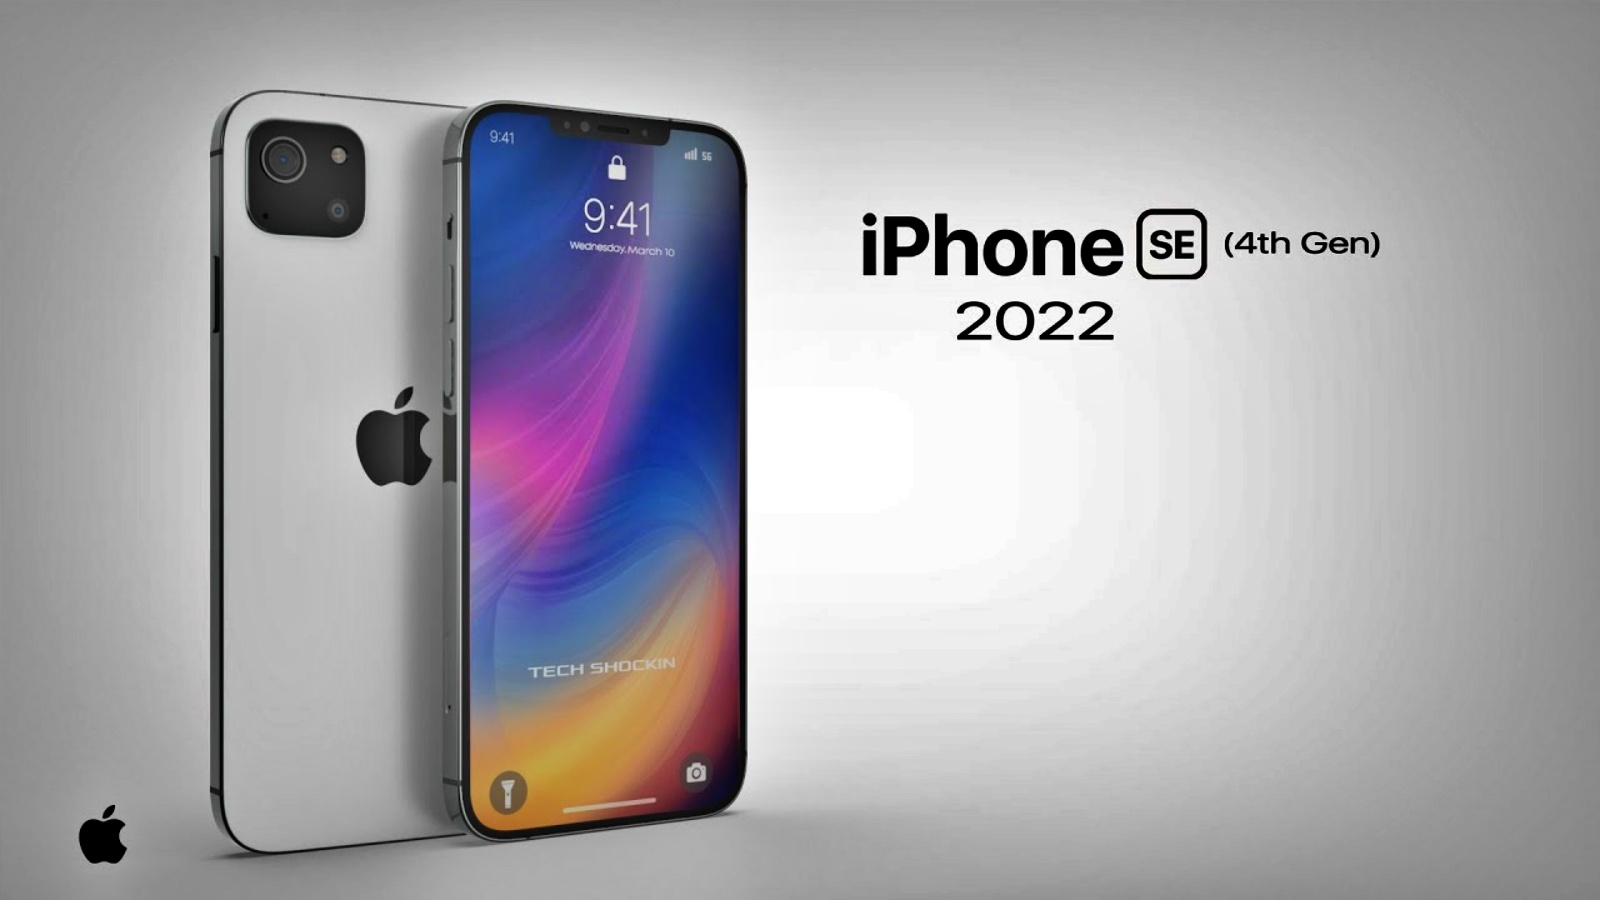 iPhone SE 2022 5g